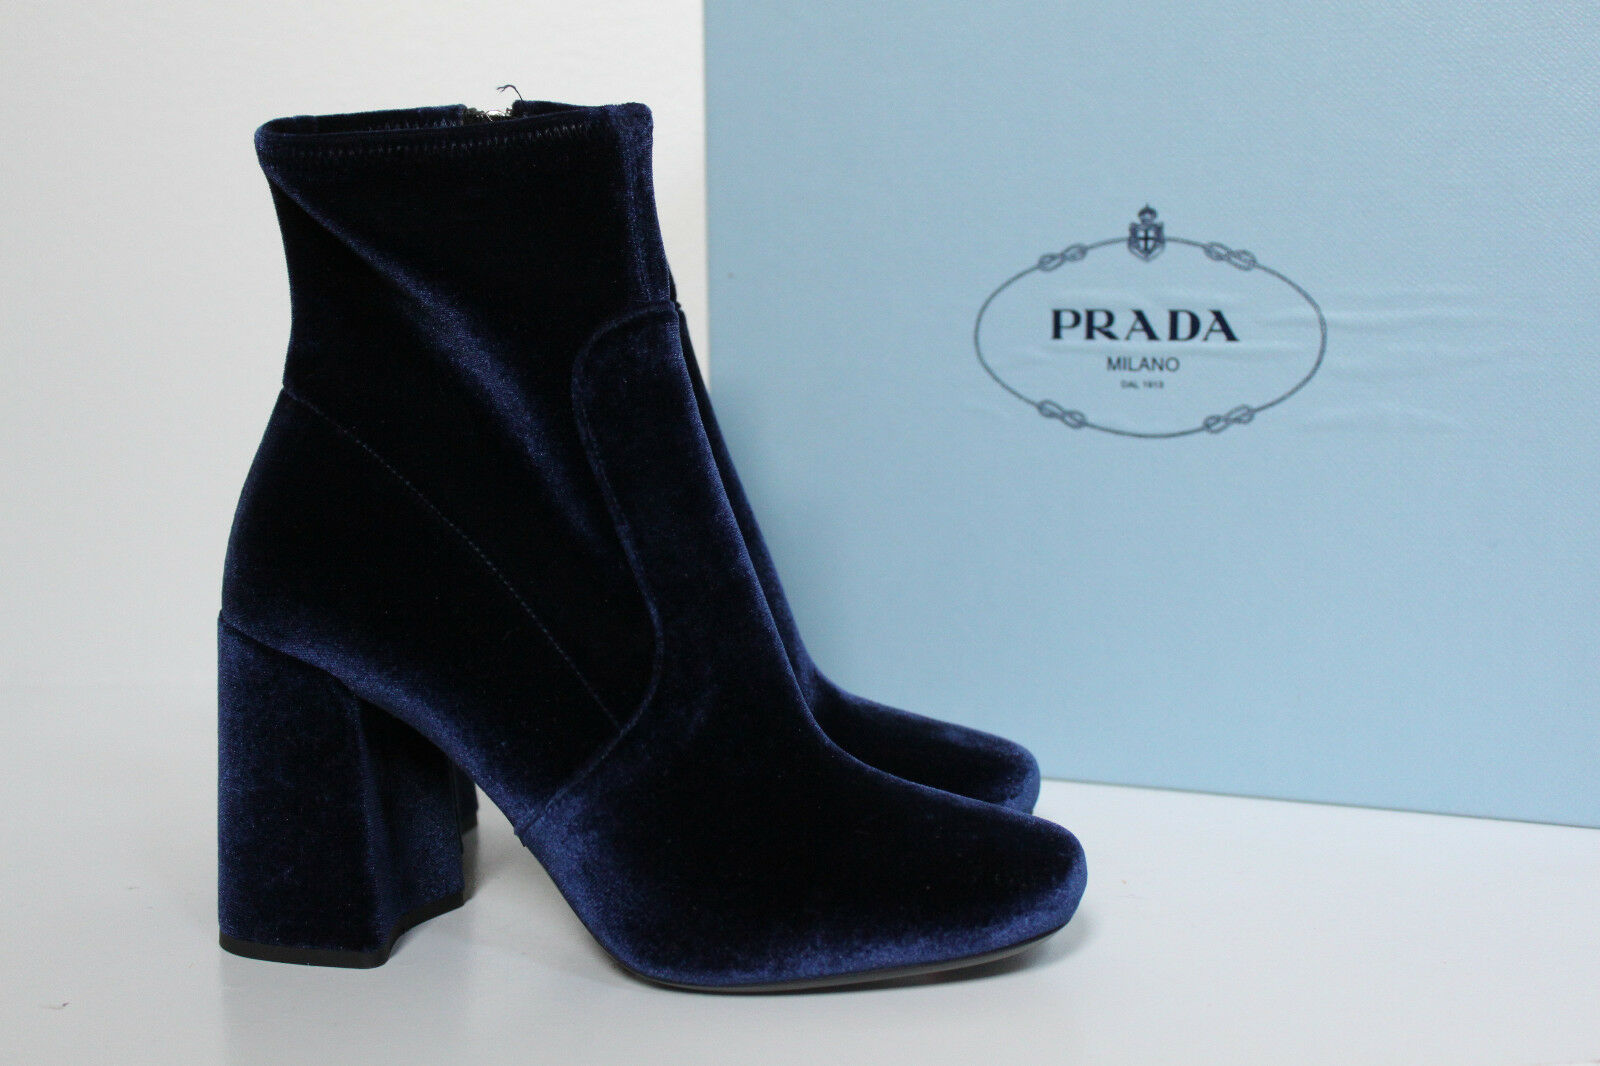 New sz 6.5 / 37 PRADA Blue Velvet Round Toe Ankle Boots Bootie Womens Shoes